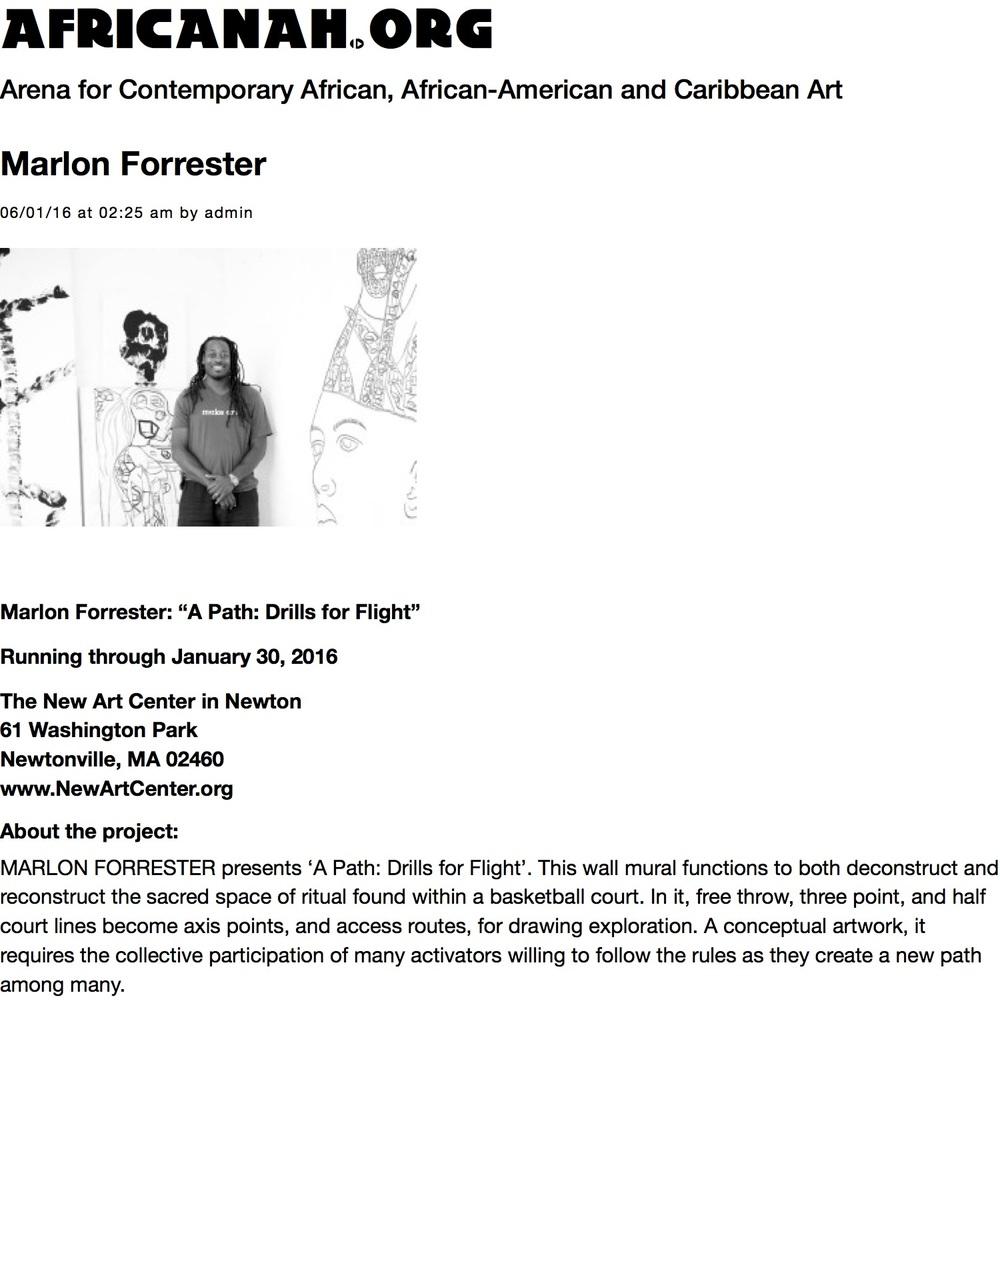 Marlon Forrester - AFRICANAH.ORG.jpg